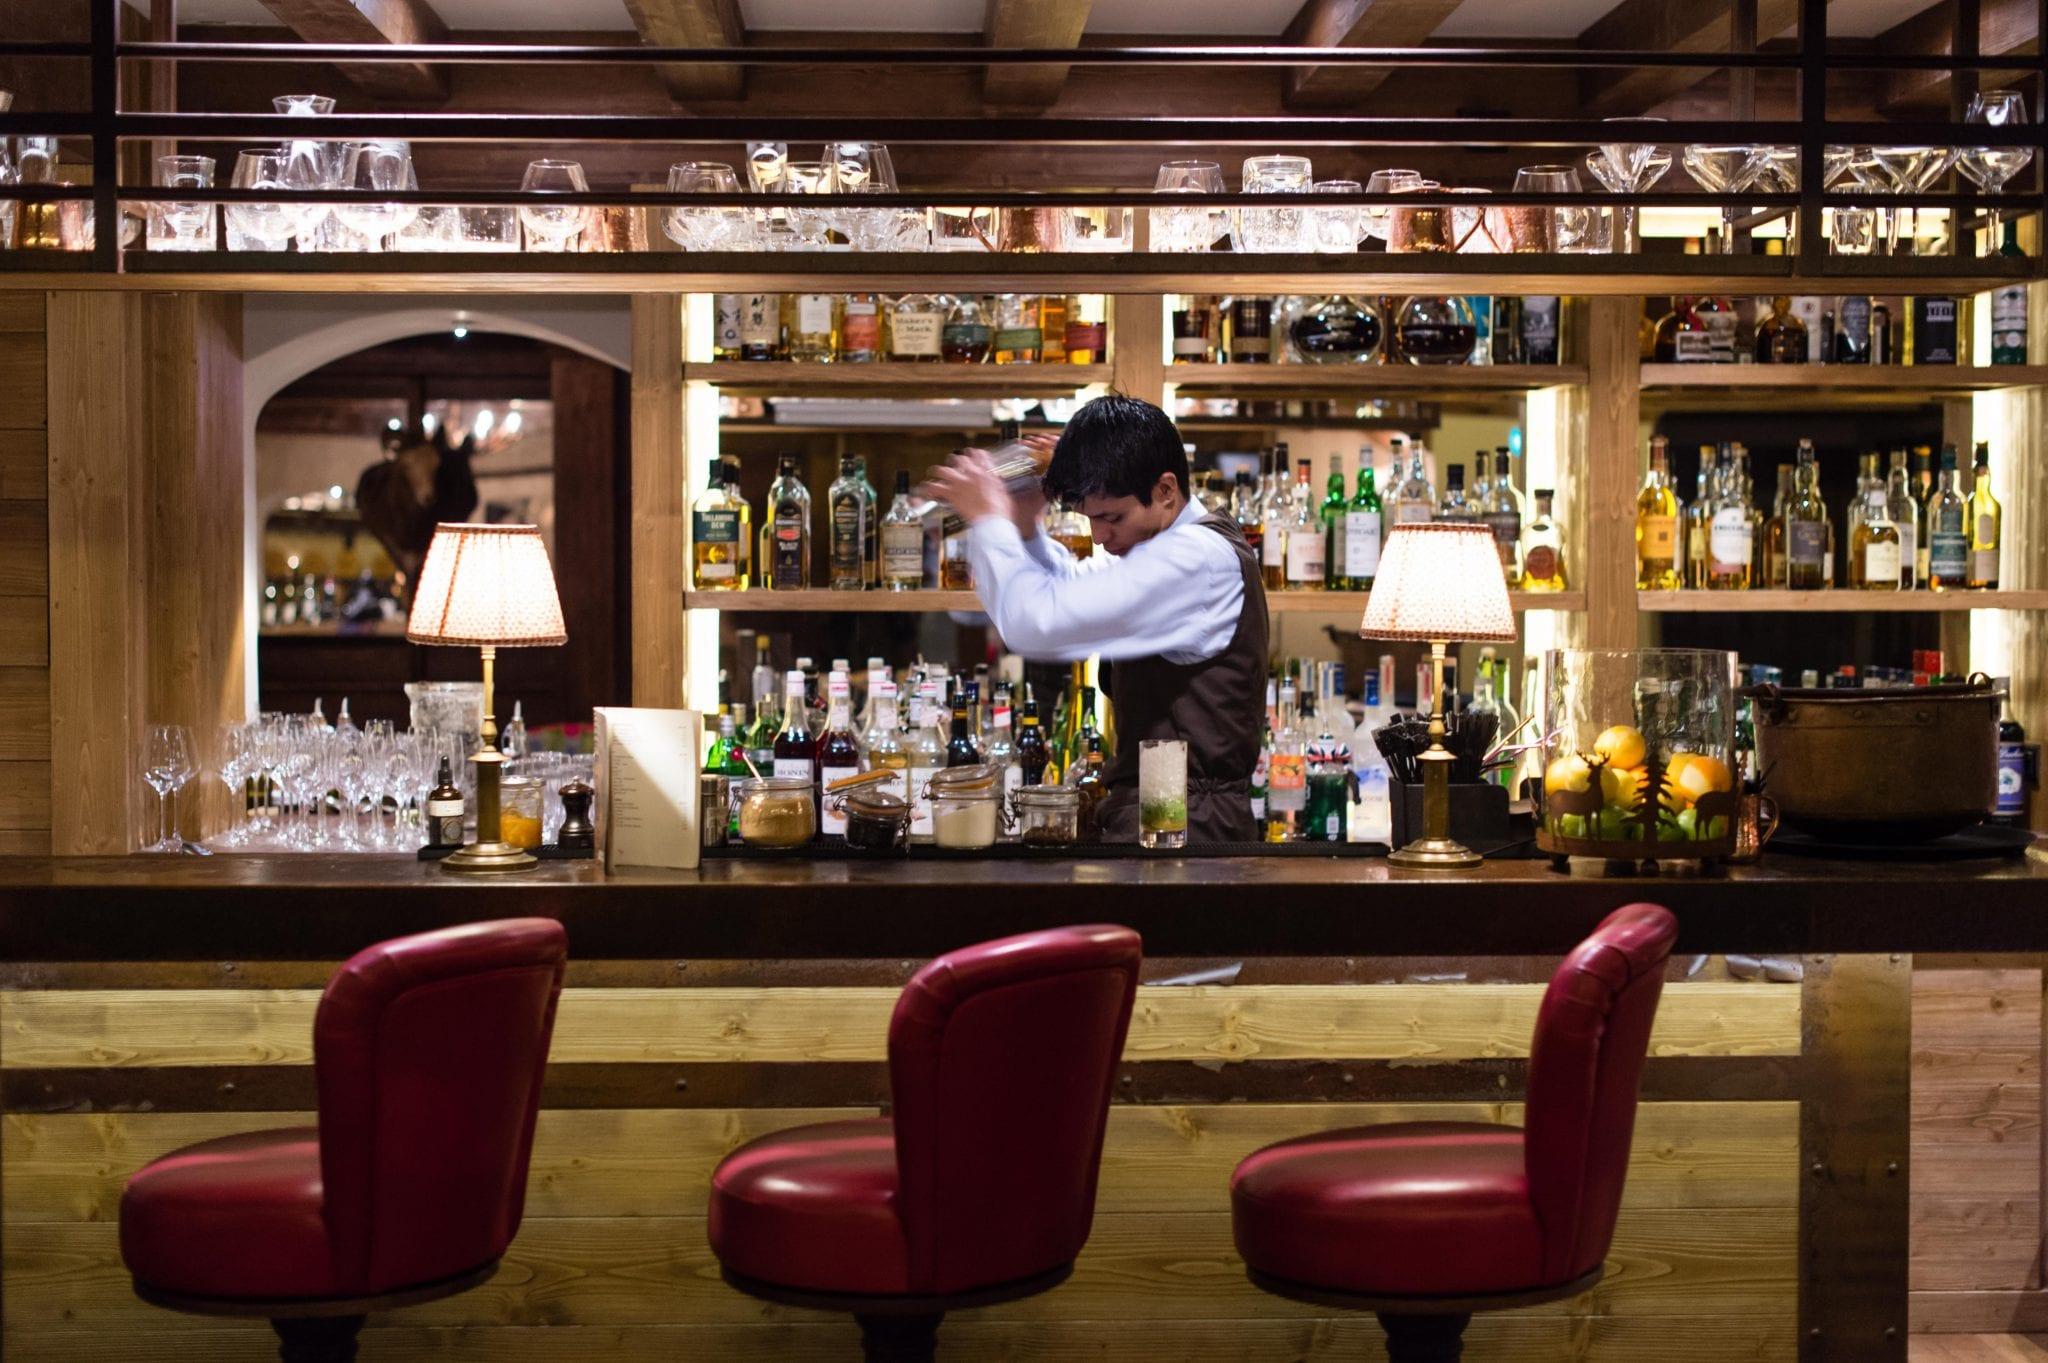 portetta-barman-amy-murrell